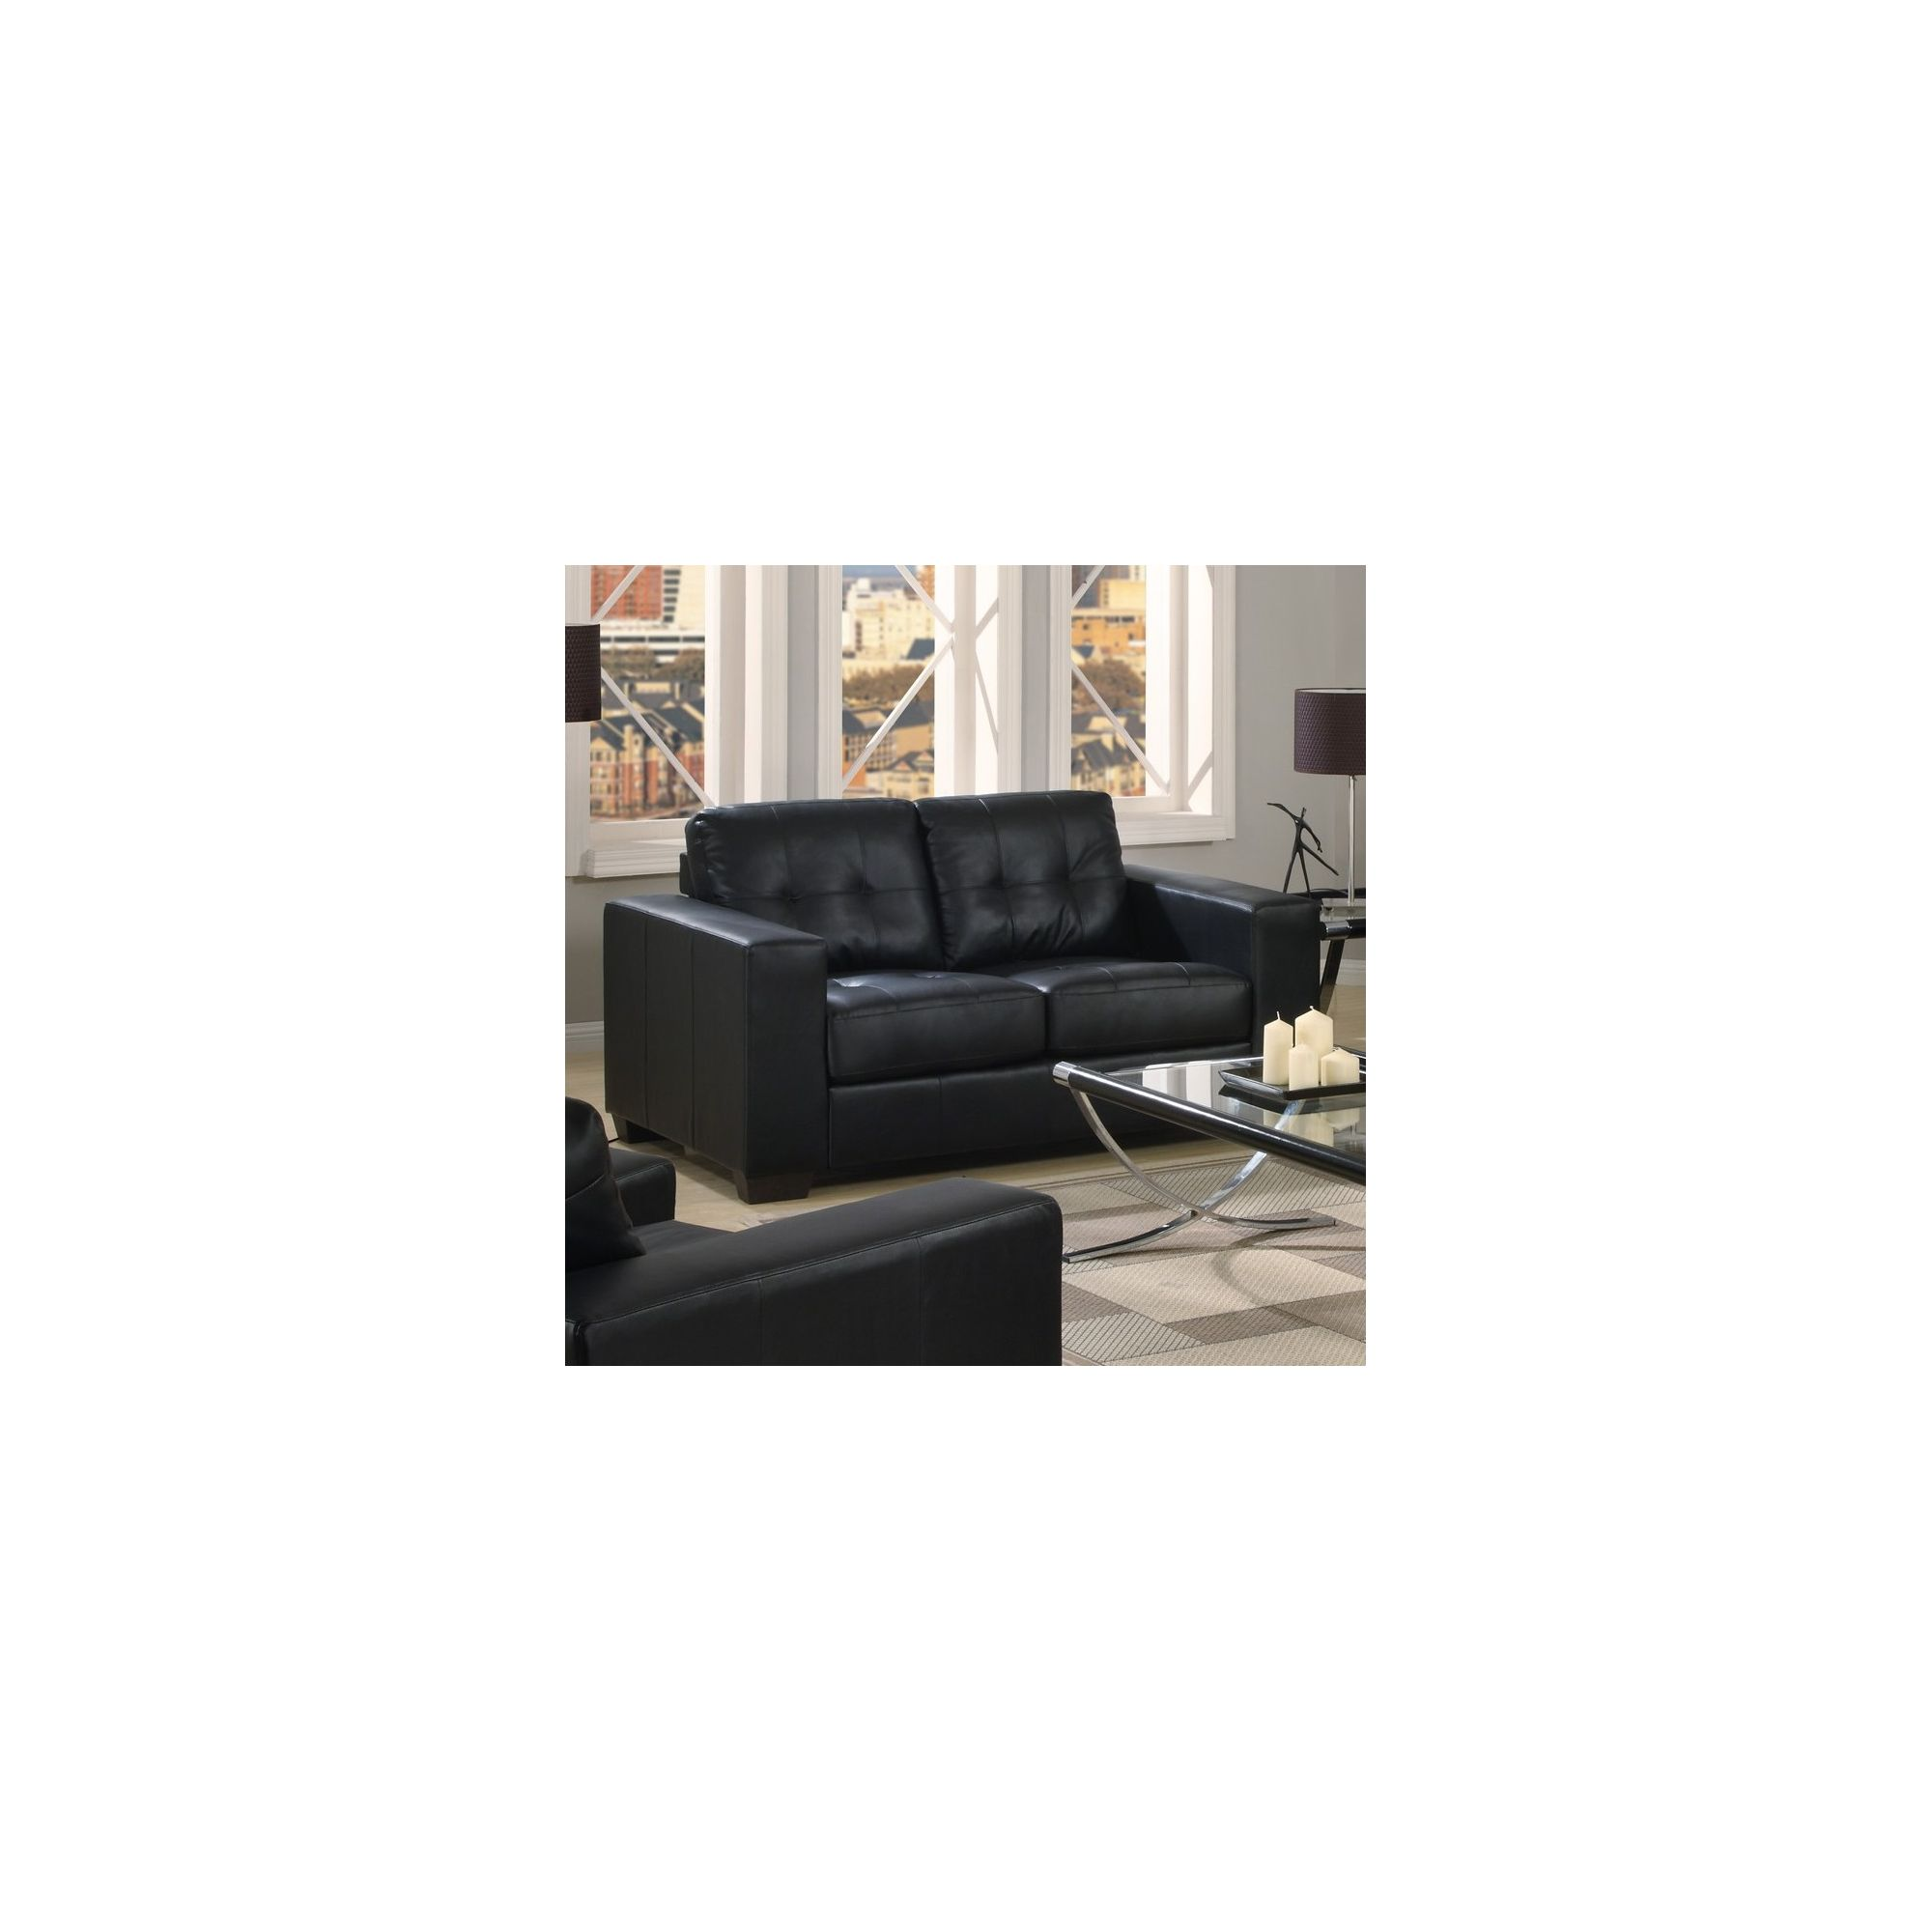 Furniture Link Gemona 2 Seater Sofa - Black at Tesco Direct